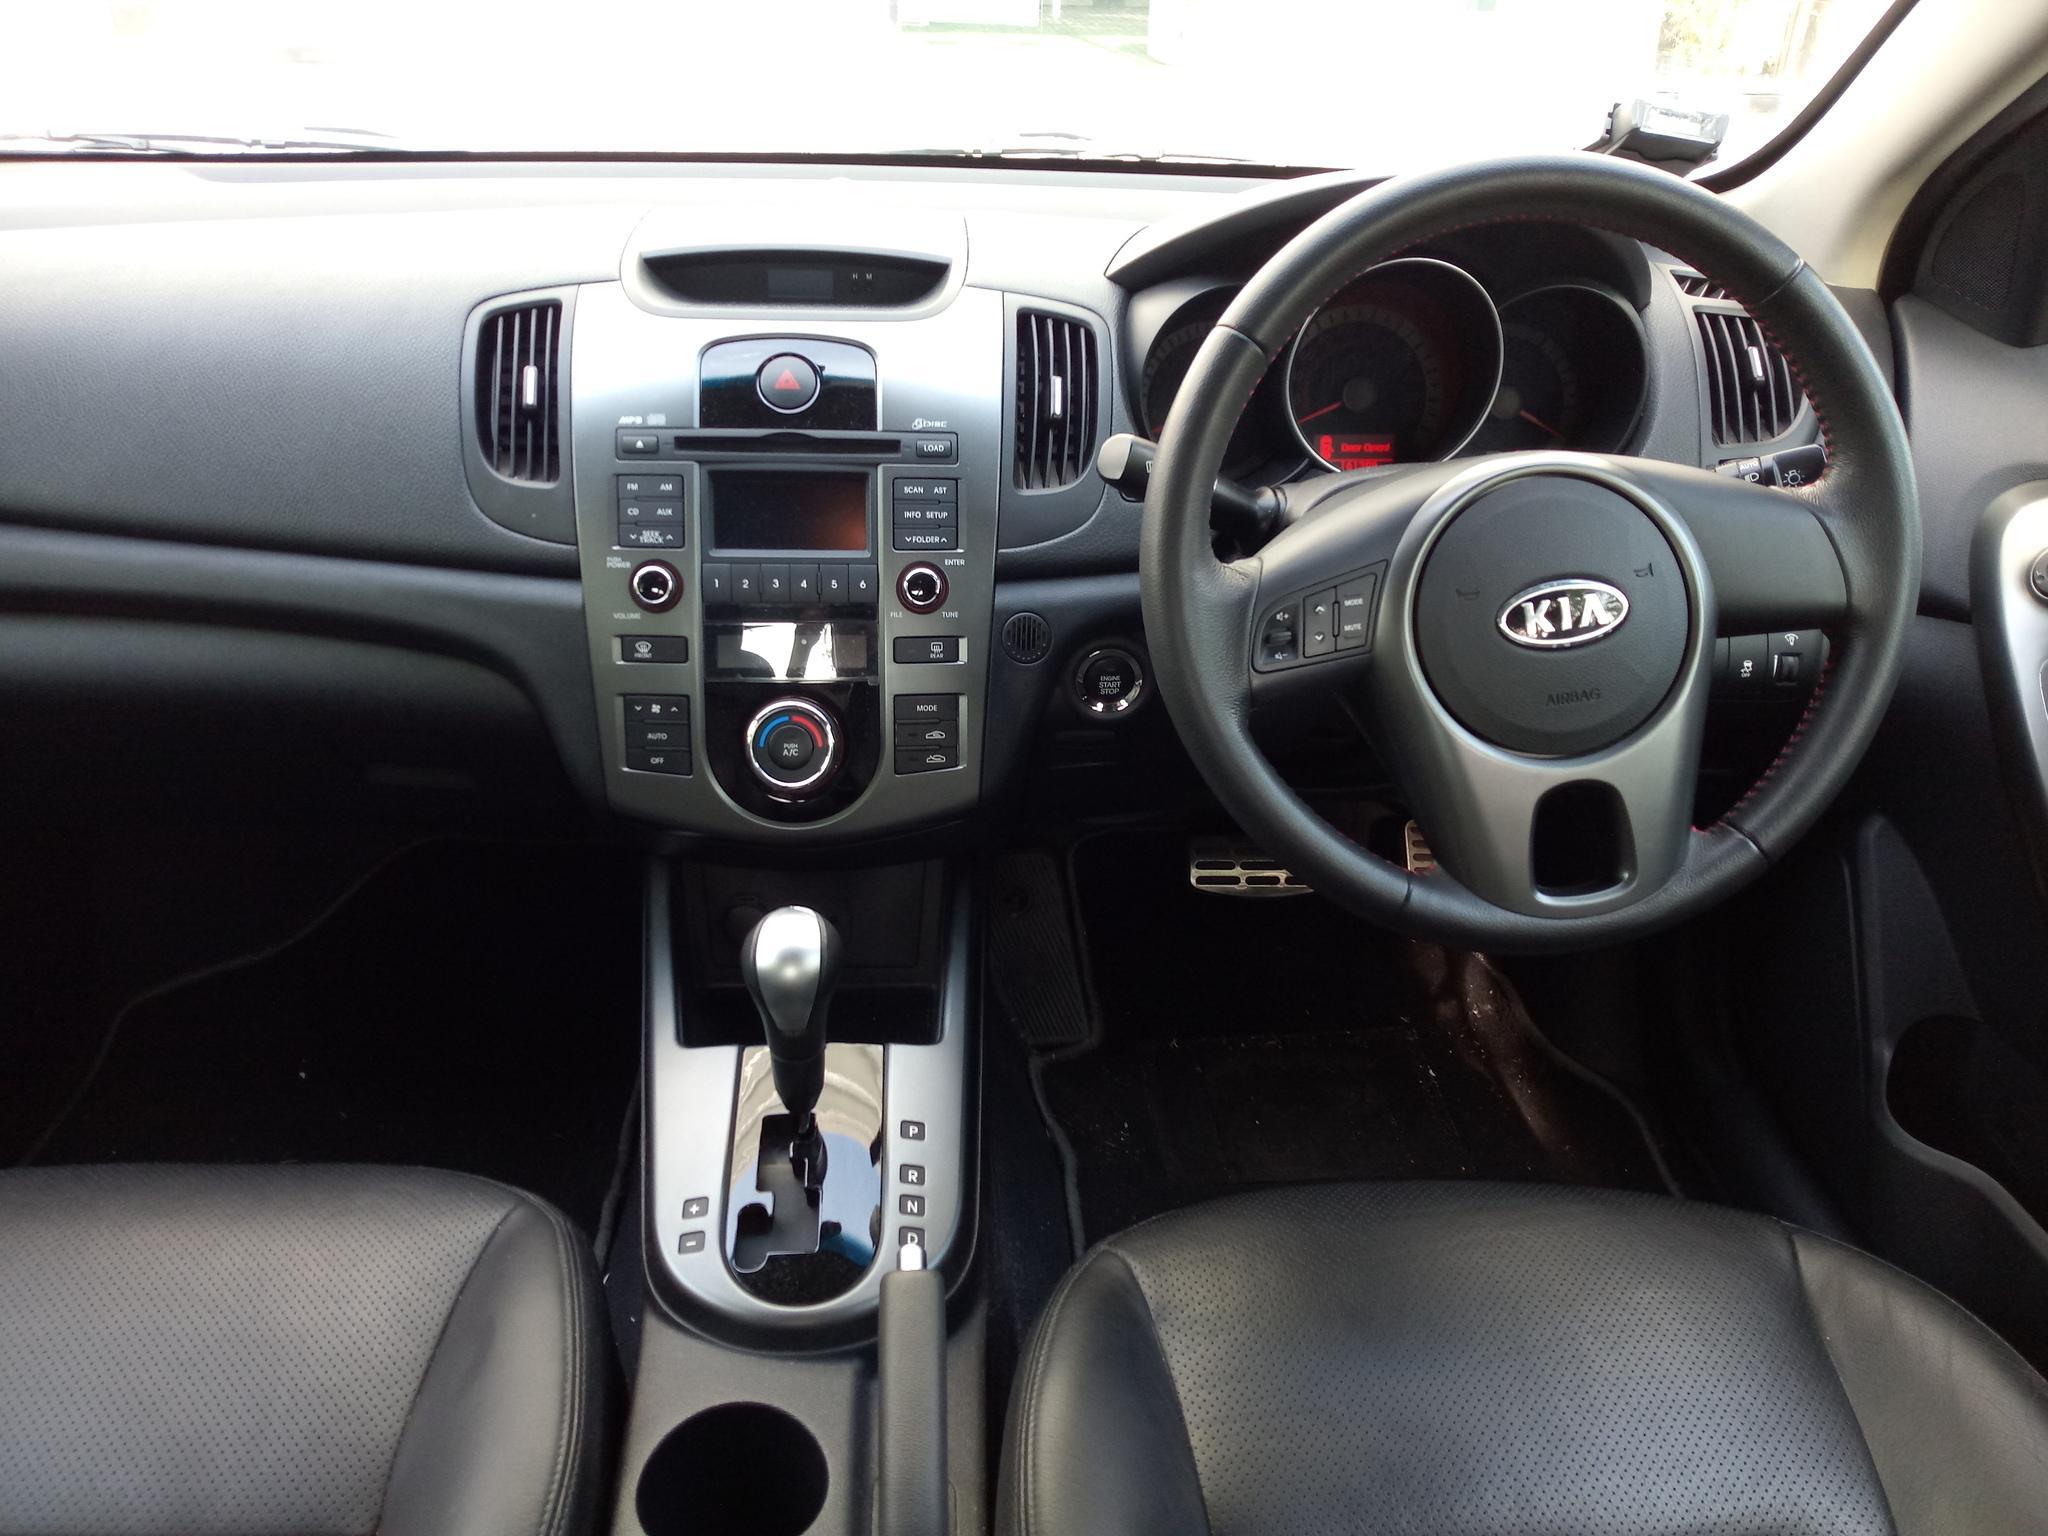 Kia Cerato Forte 1.6A Comfy Ride for Personal & PHV Usage